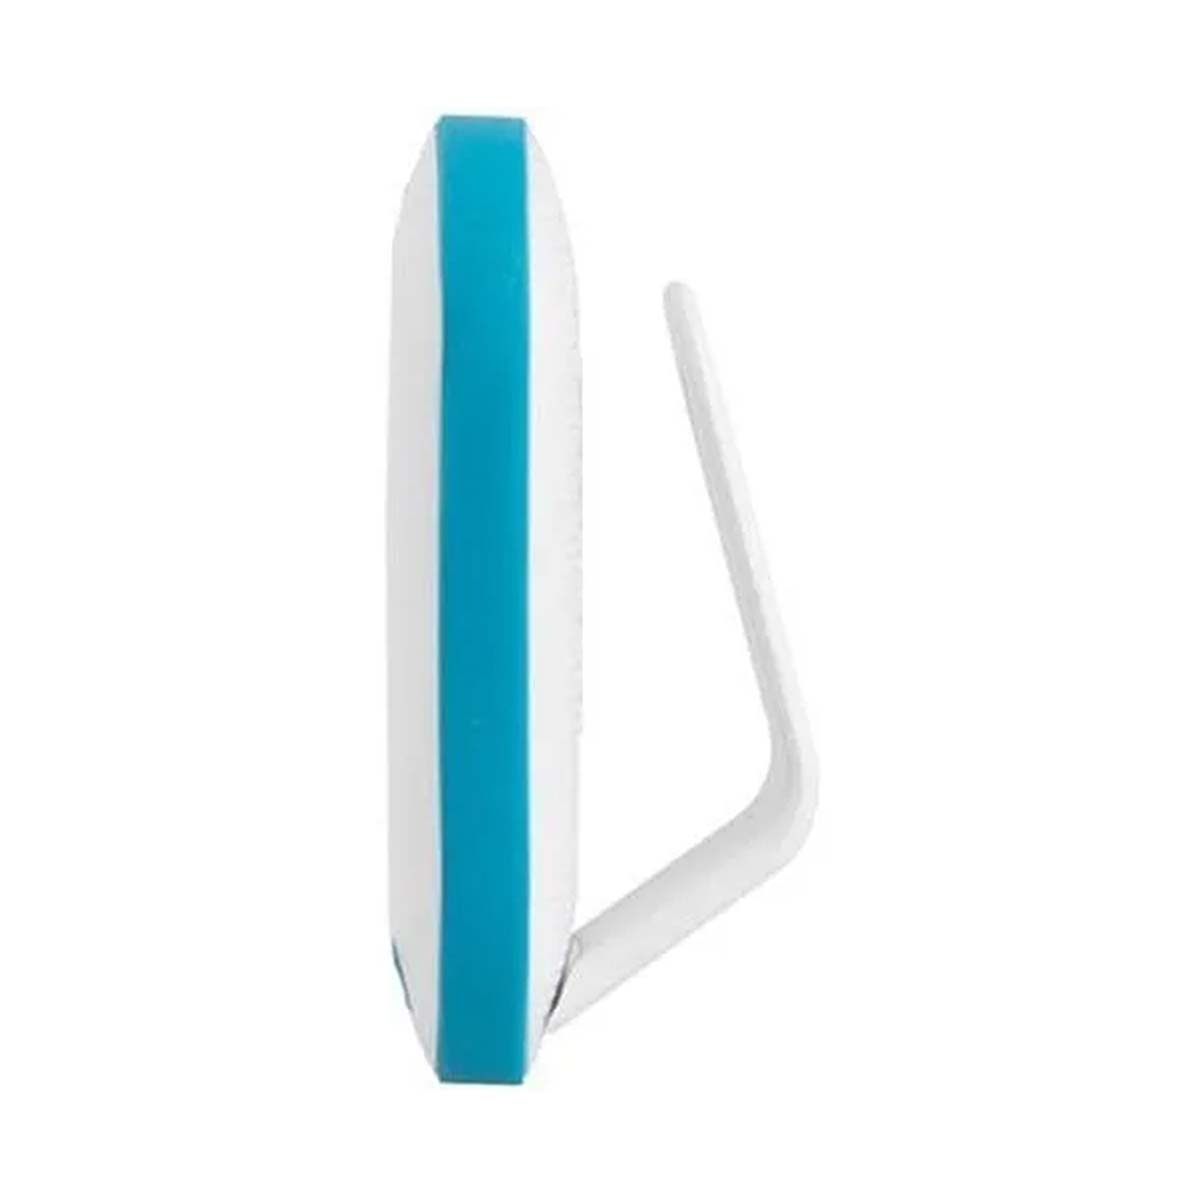 Kit 09 Controle Remoto Intelbras 433mhz Xac 4000 Smart Azul